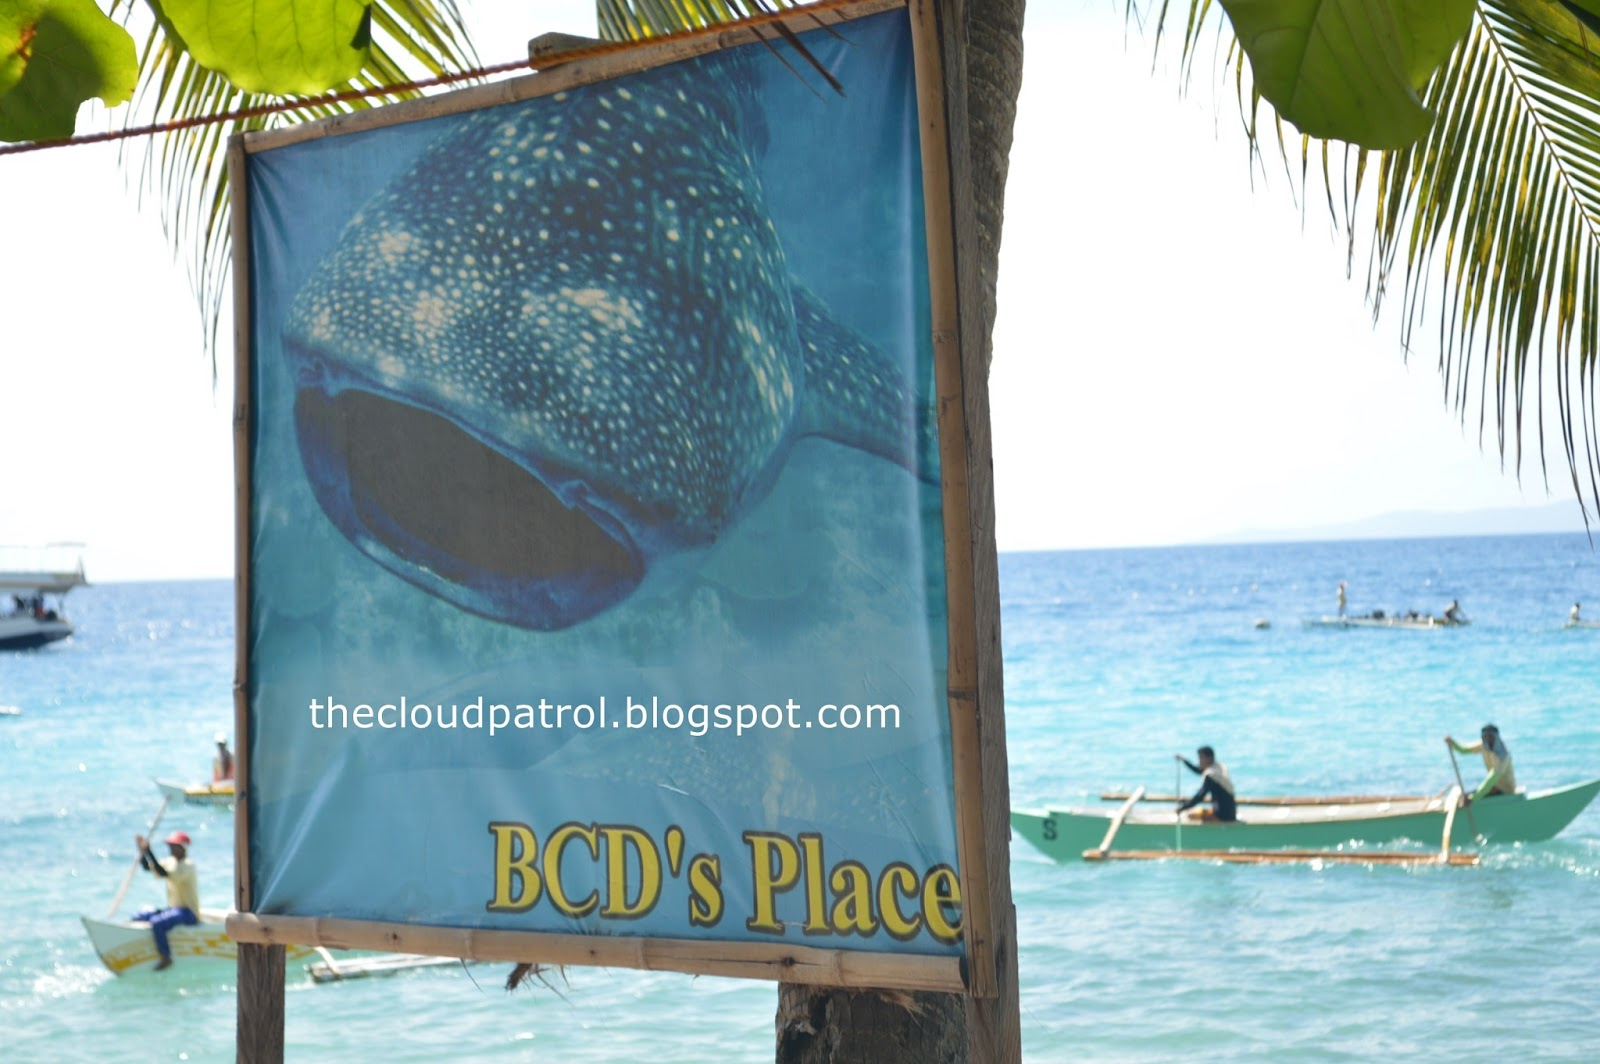 Butanding, whale shark, cebu, oslob, philippines, BCD, BCD's place, resort